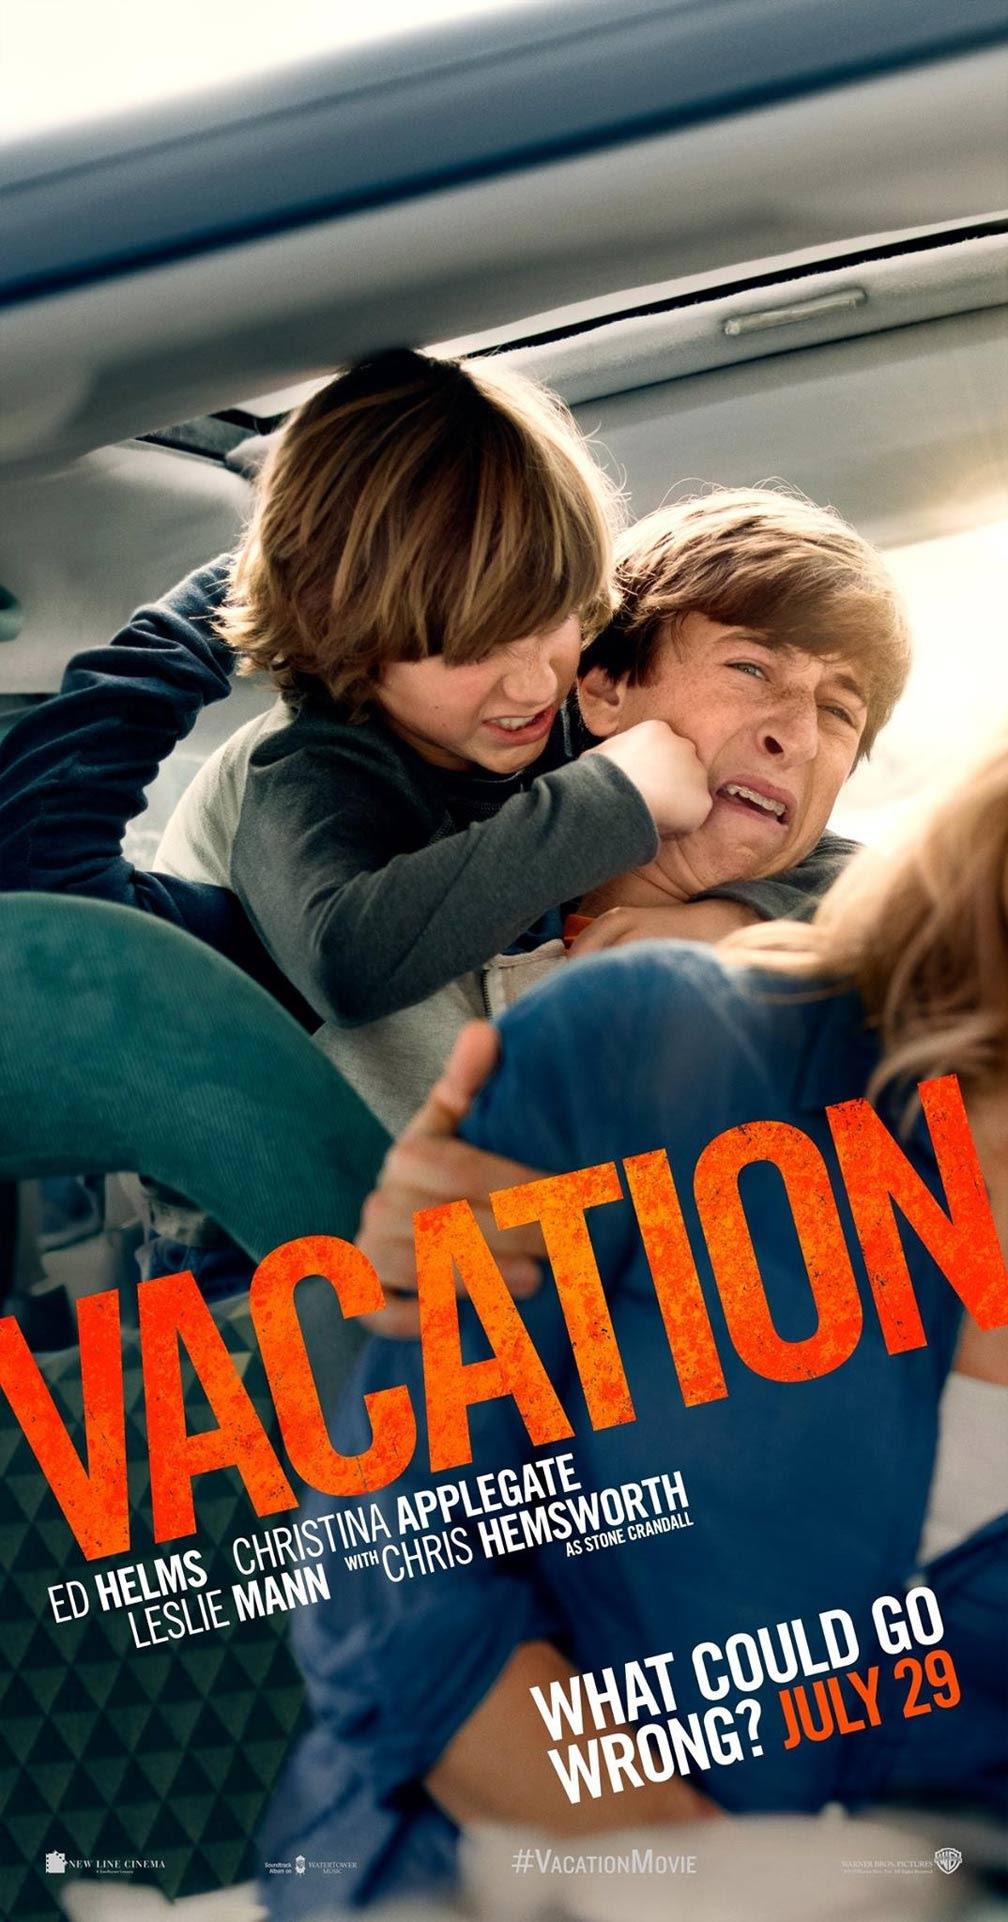 Vacation (2015) Poster #1 - TrailerAddict